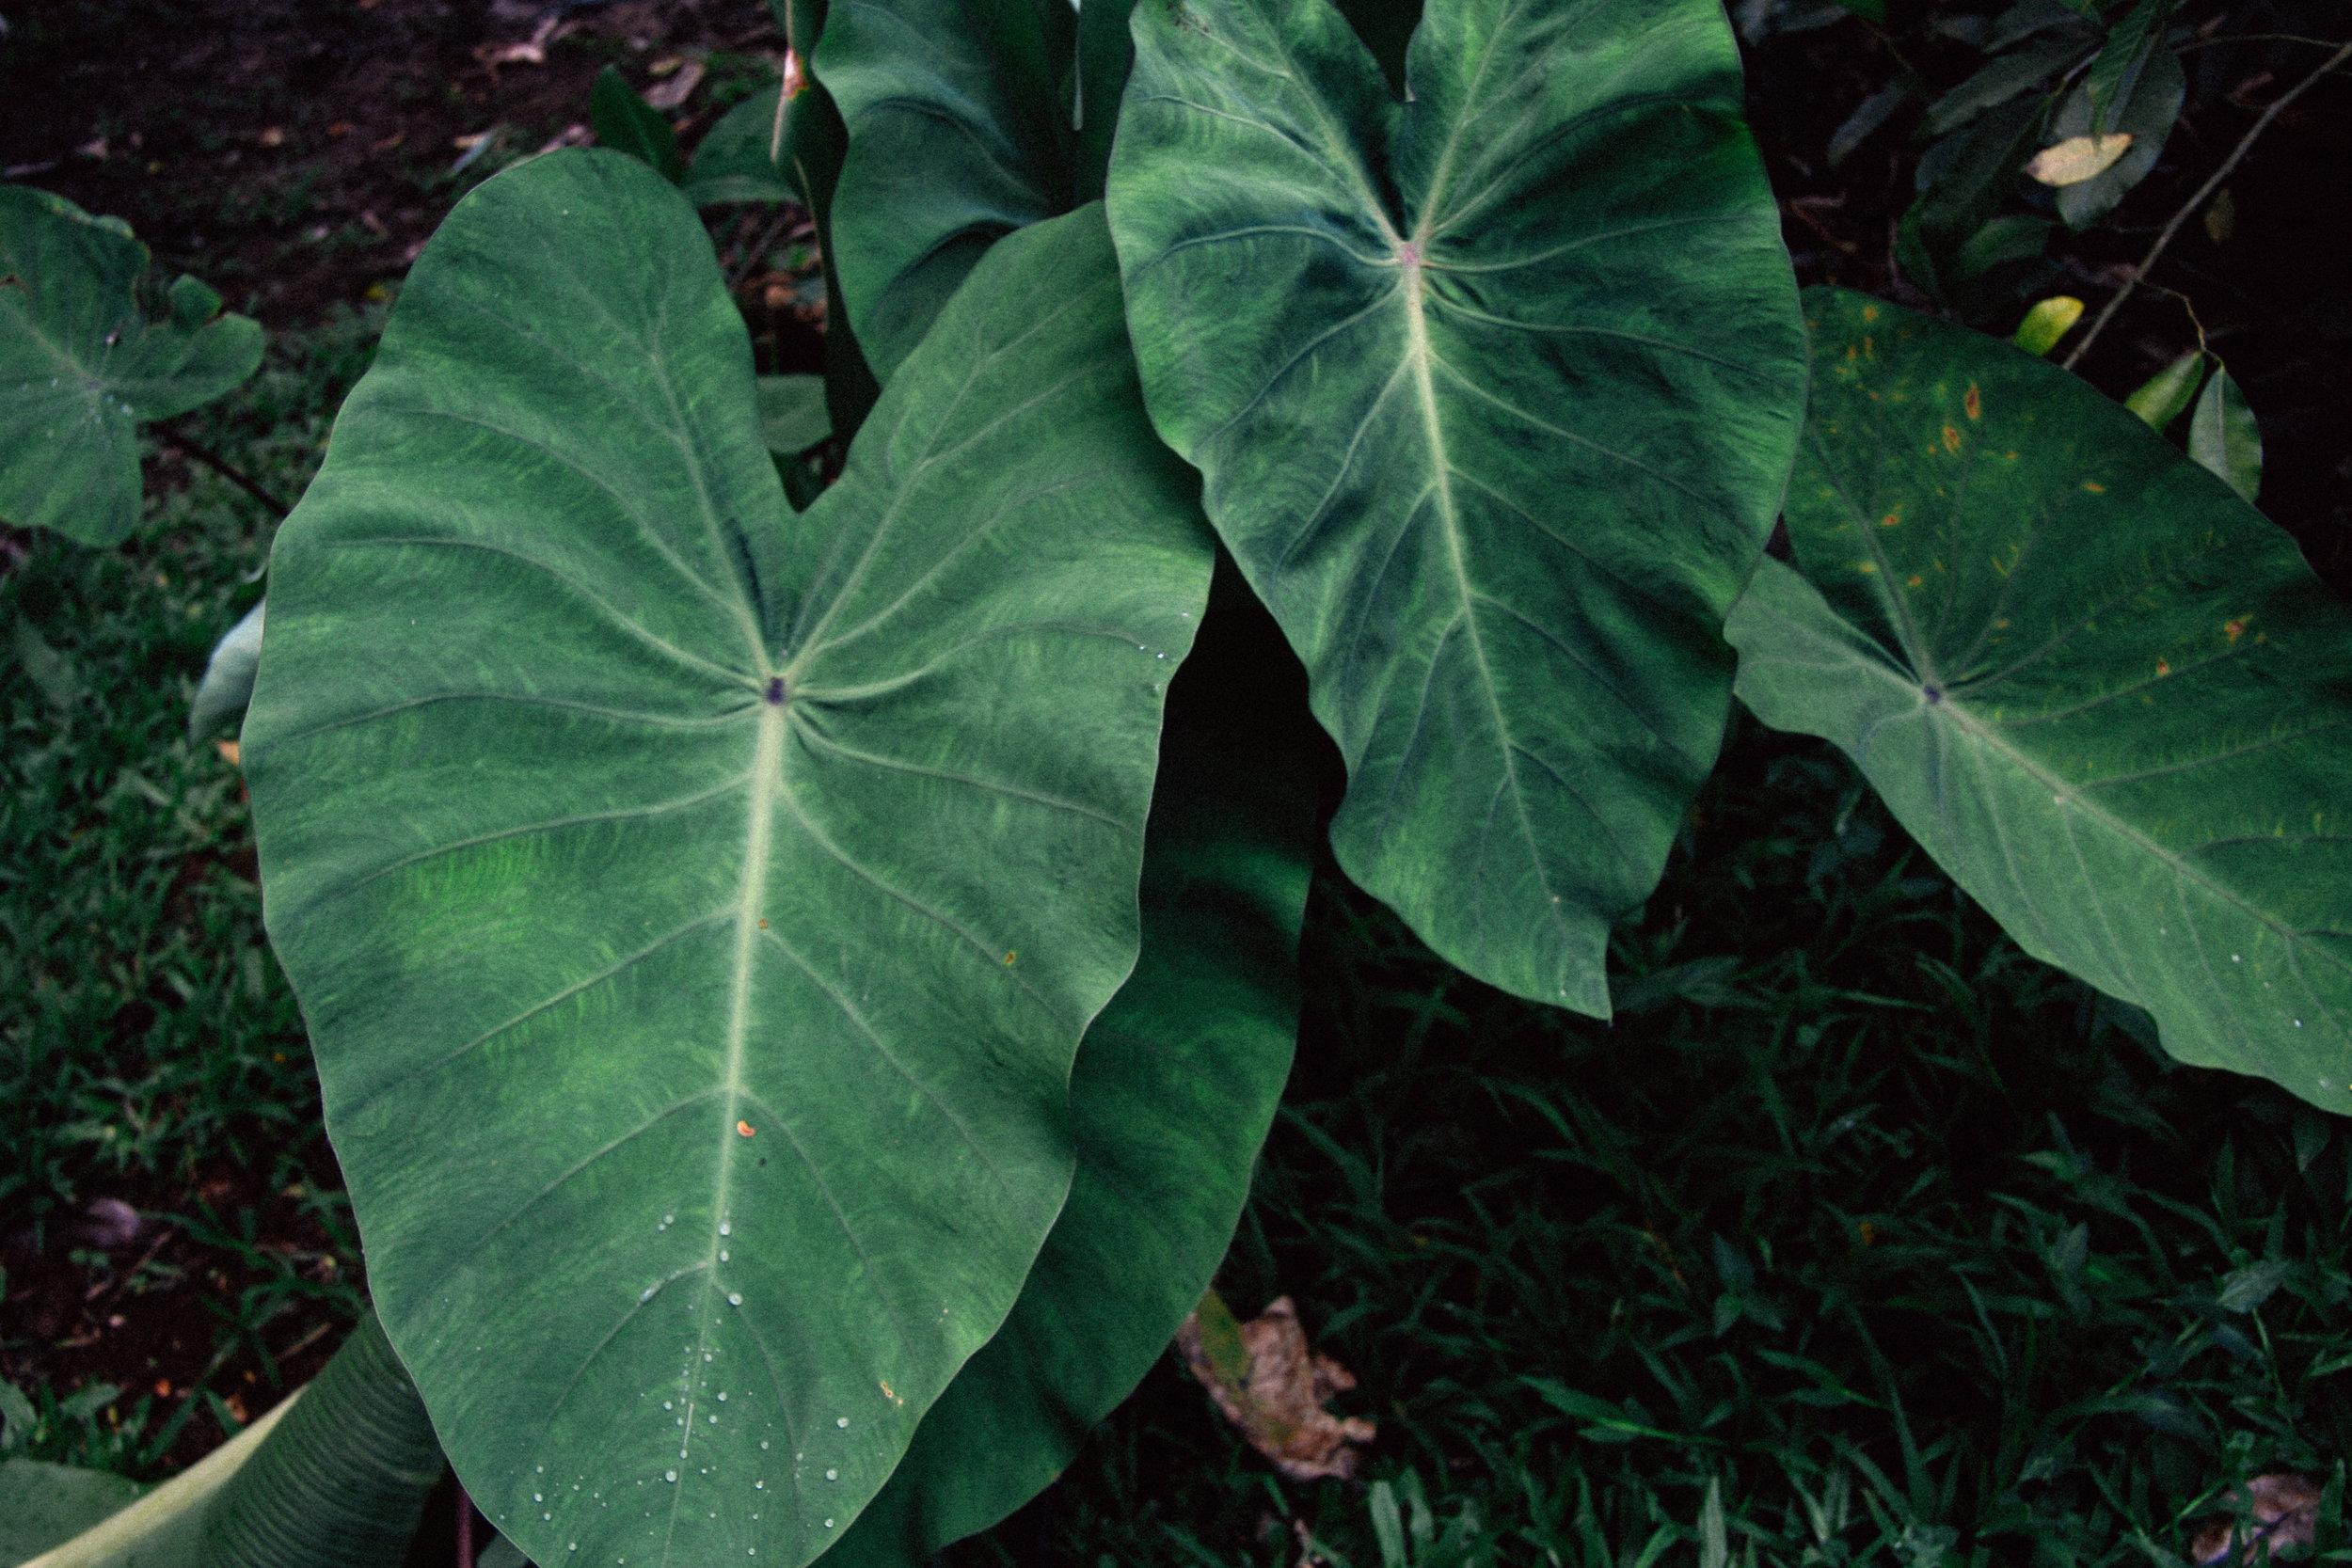 Kalo, Taro,  Colocasia esculenta  (Araceae)